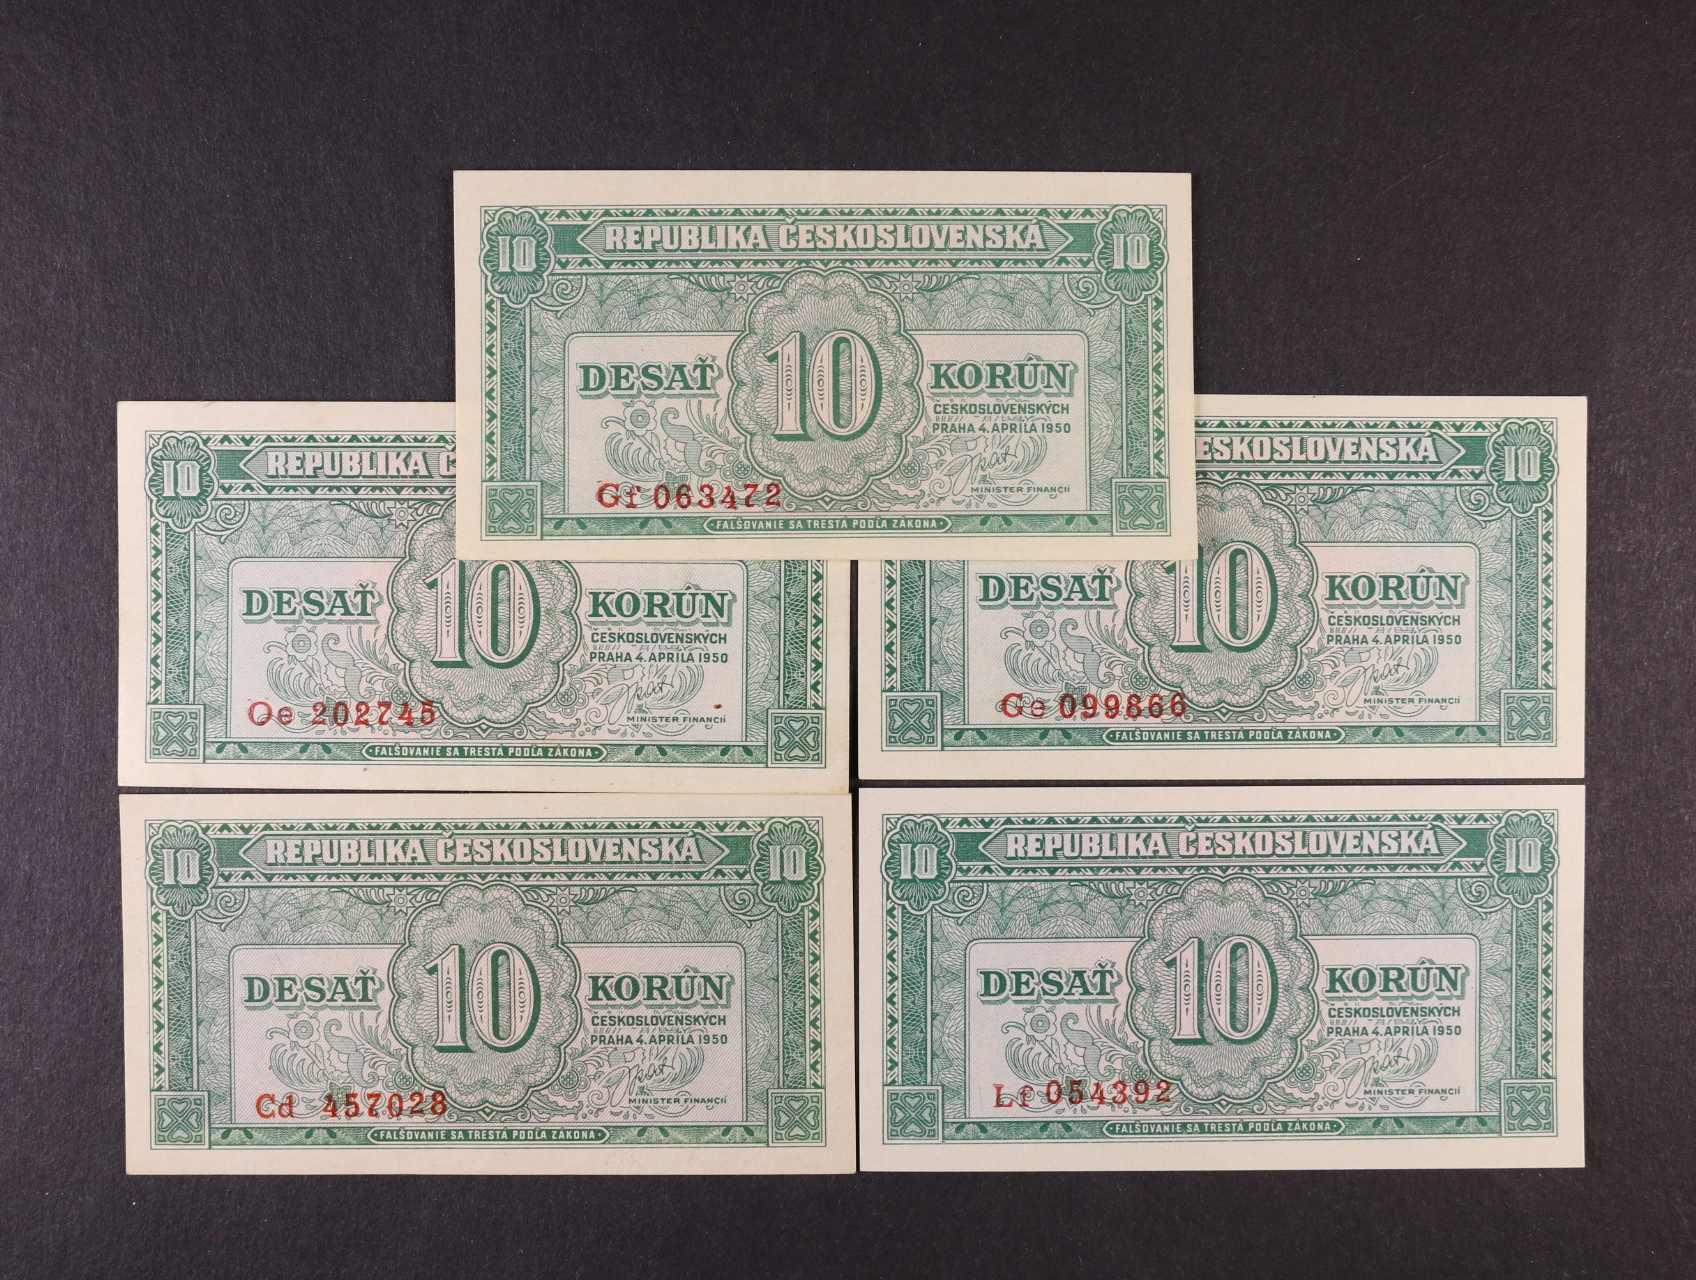 10 Kčs 4.4.1950 série Cd, Ge, Oe, Lf, Gf, Ba. 84b, Pi. 69a, 5ks